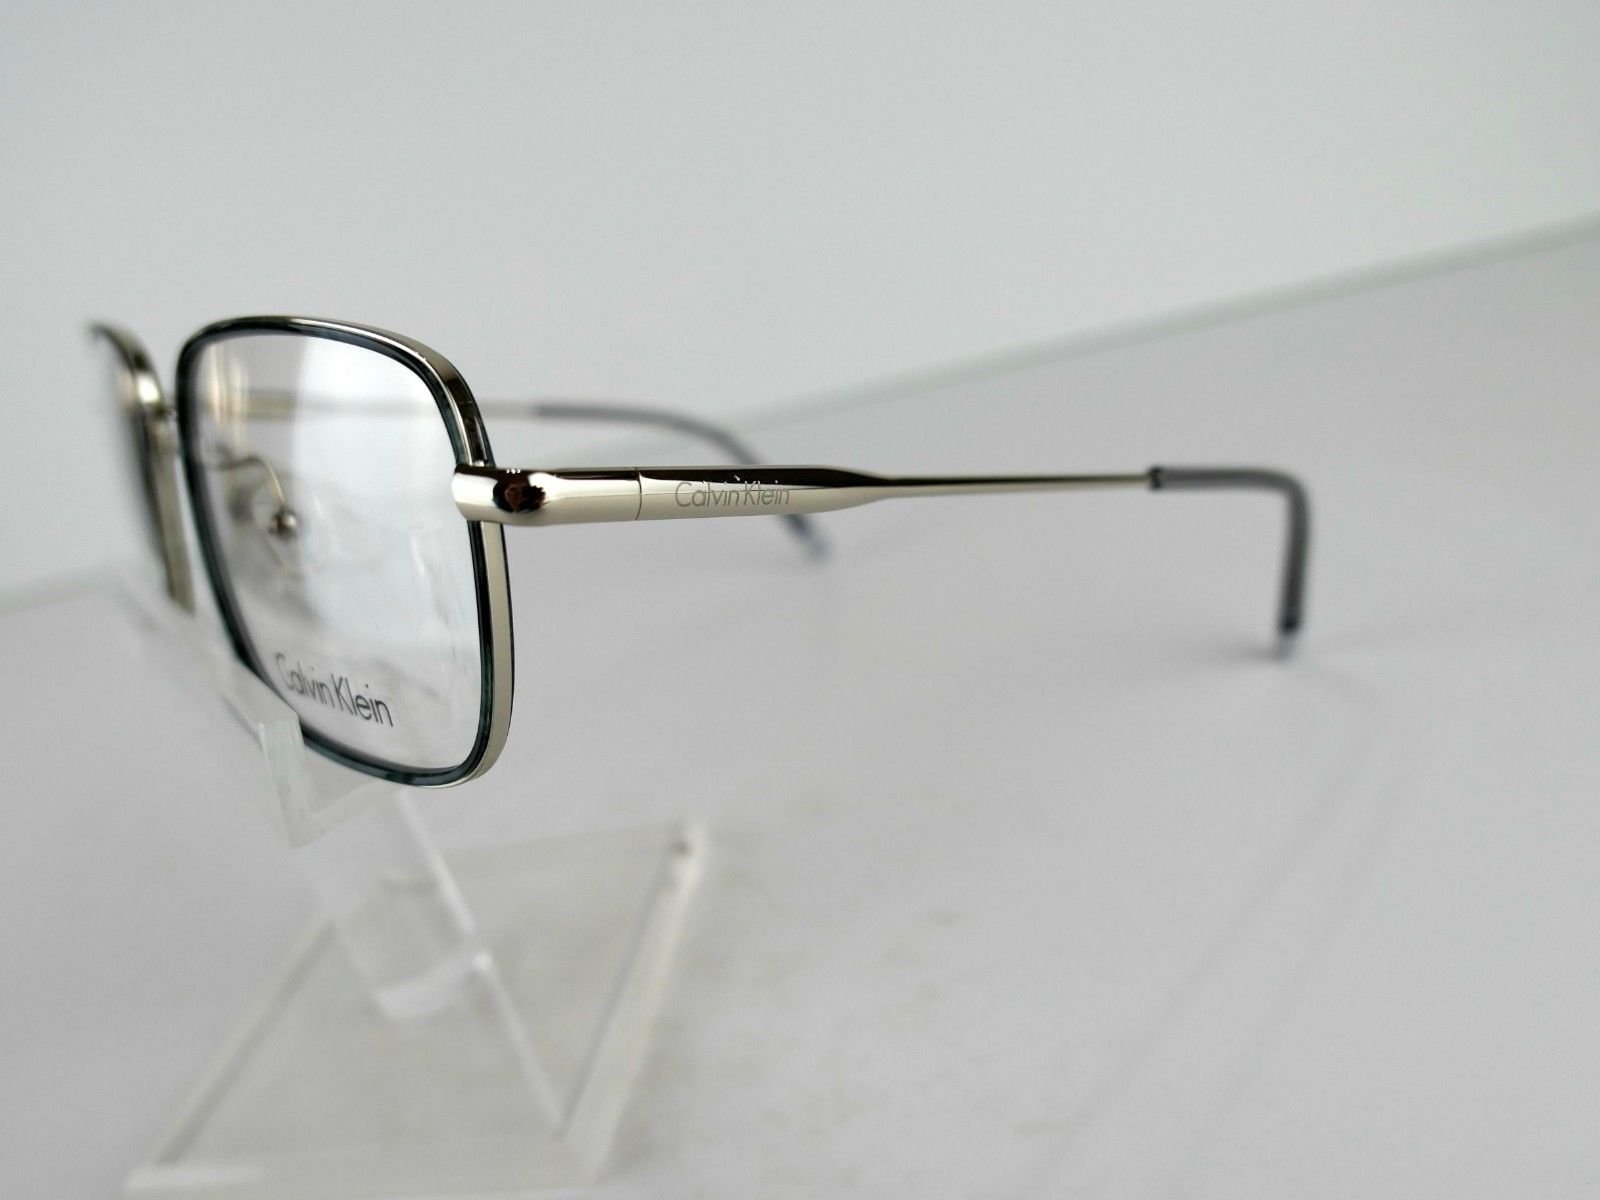 CALVIN KLEIN ck 5456 (037) Grey Havana / Silver  55 X 18 145 mm Eyeglass Frame